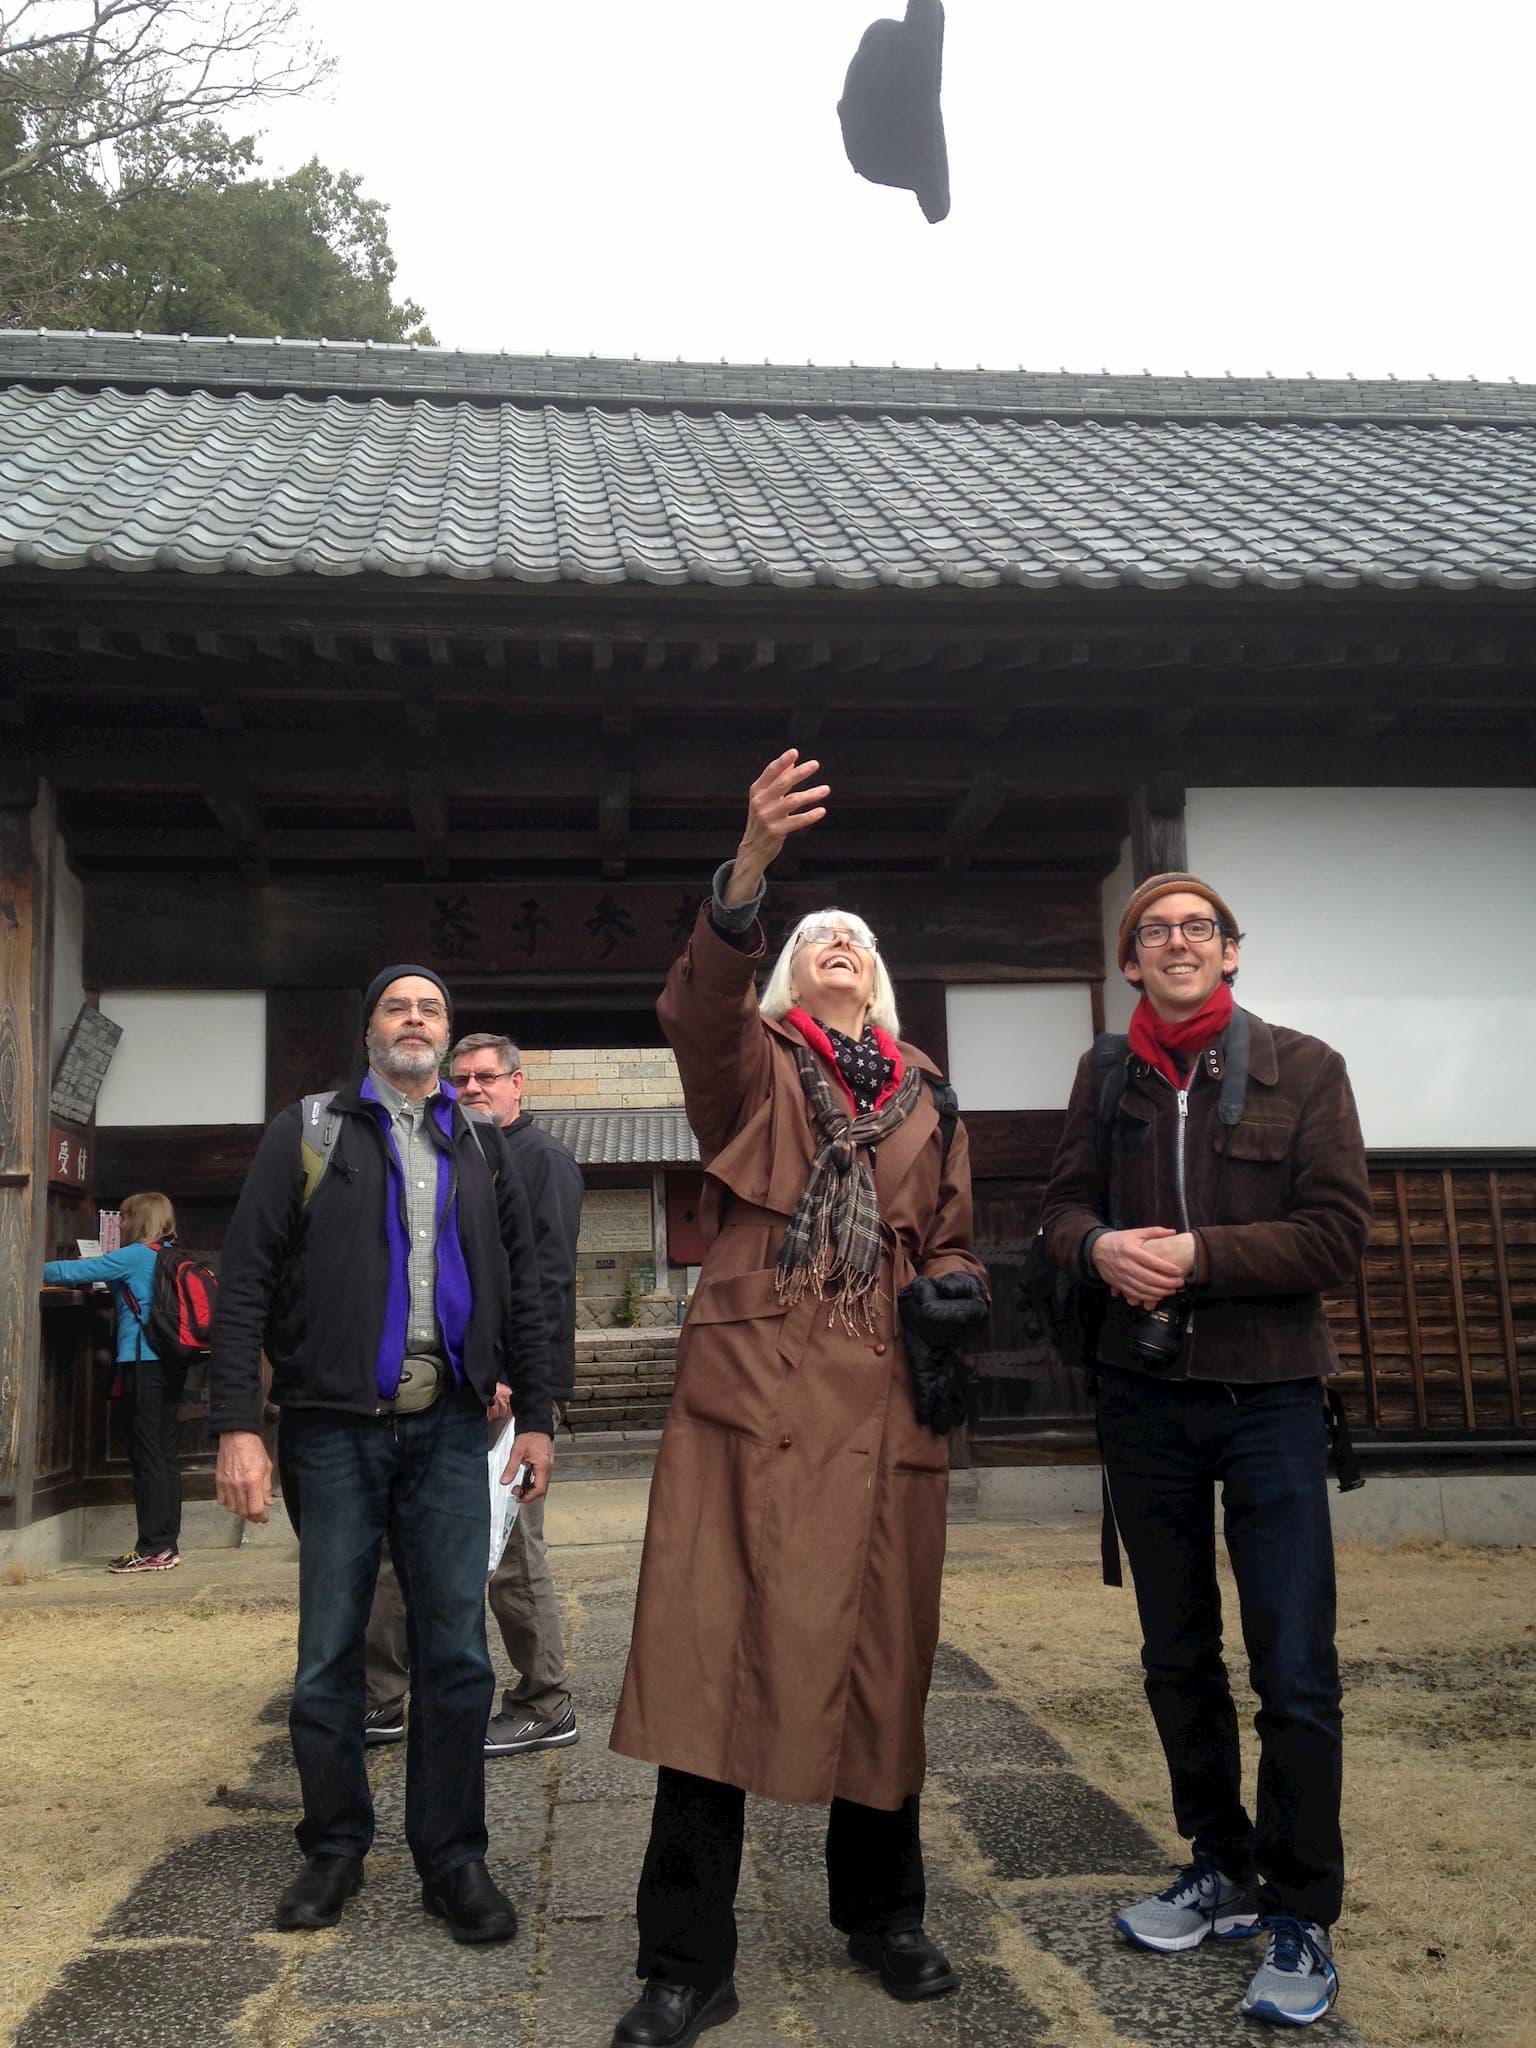 Guillermo Cuellar, Clary Illian, & Mason Hiatt pose in front of Shoji Hamada's studio museum in Mashiko, Japan, 2016. Courtesy of Guillermo Cuellar